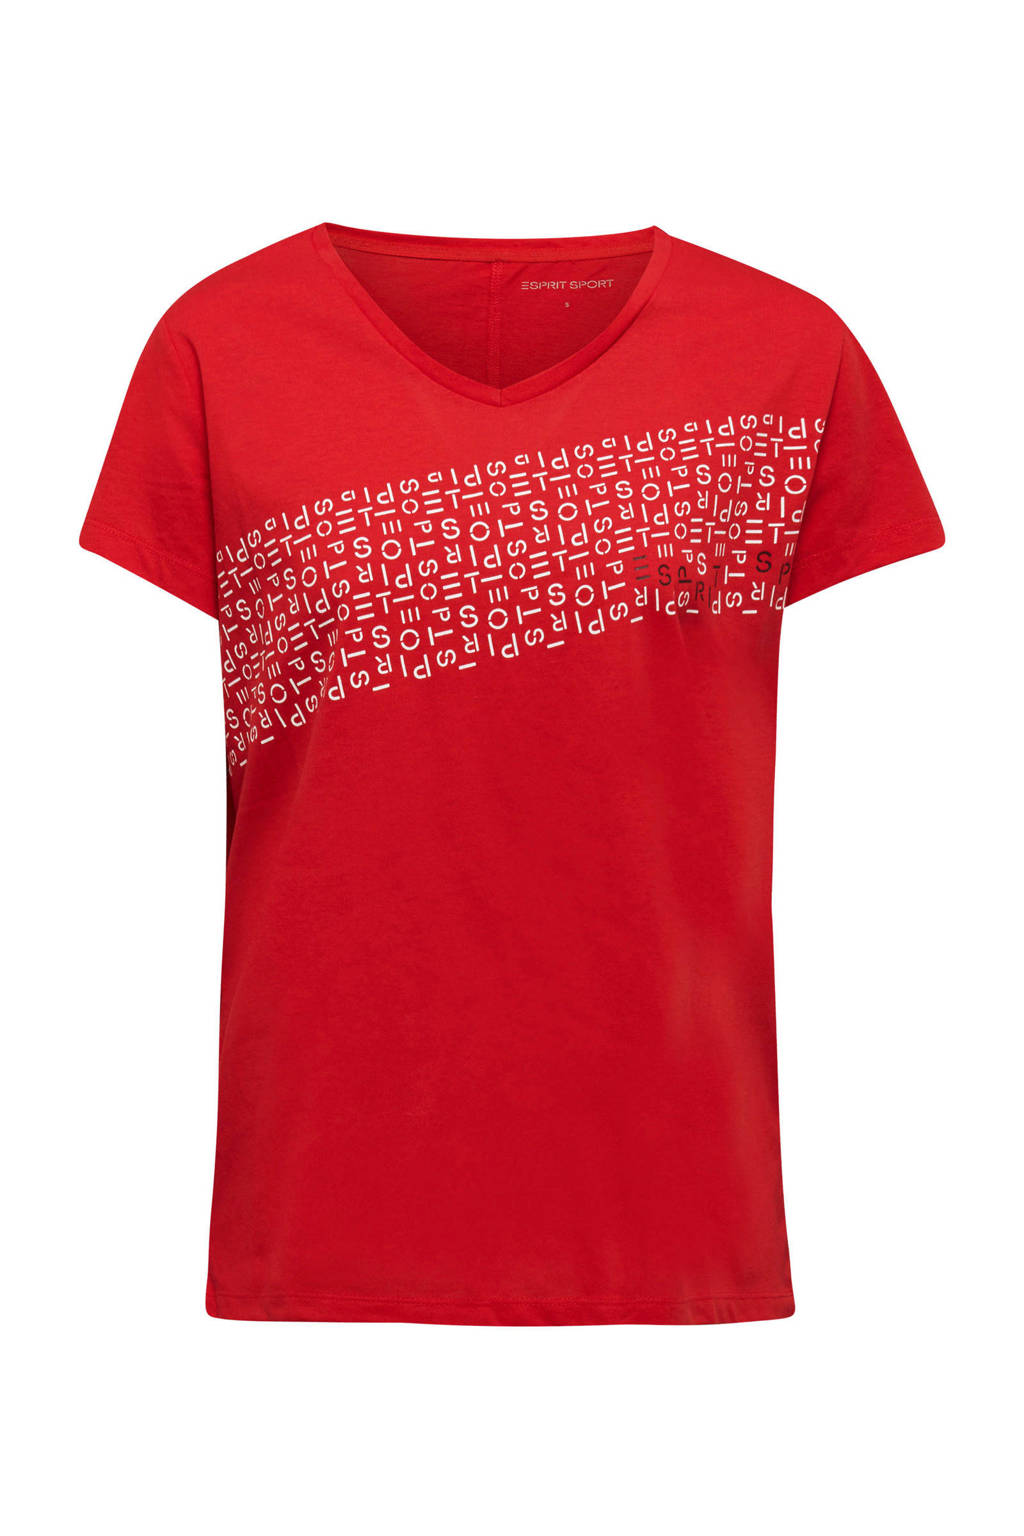 ESPRIT Women Sports T-shirt rood, Rood